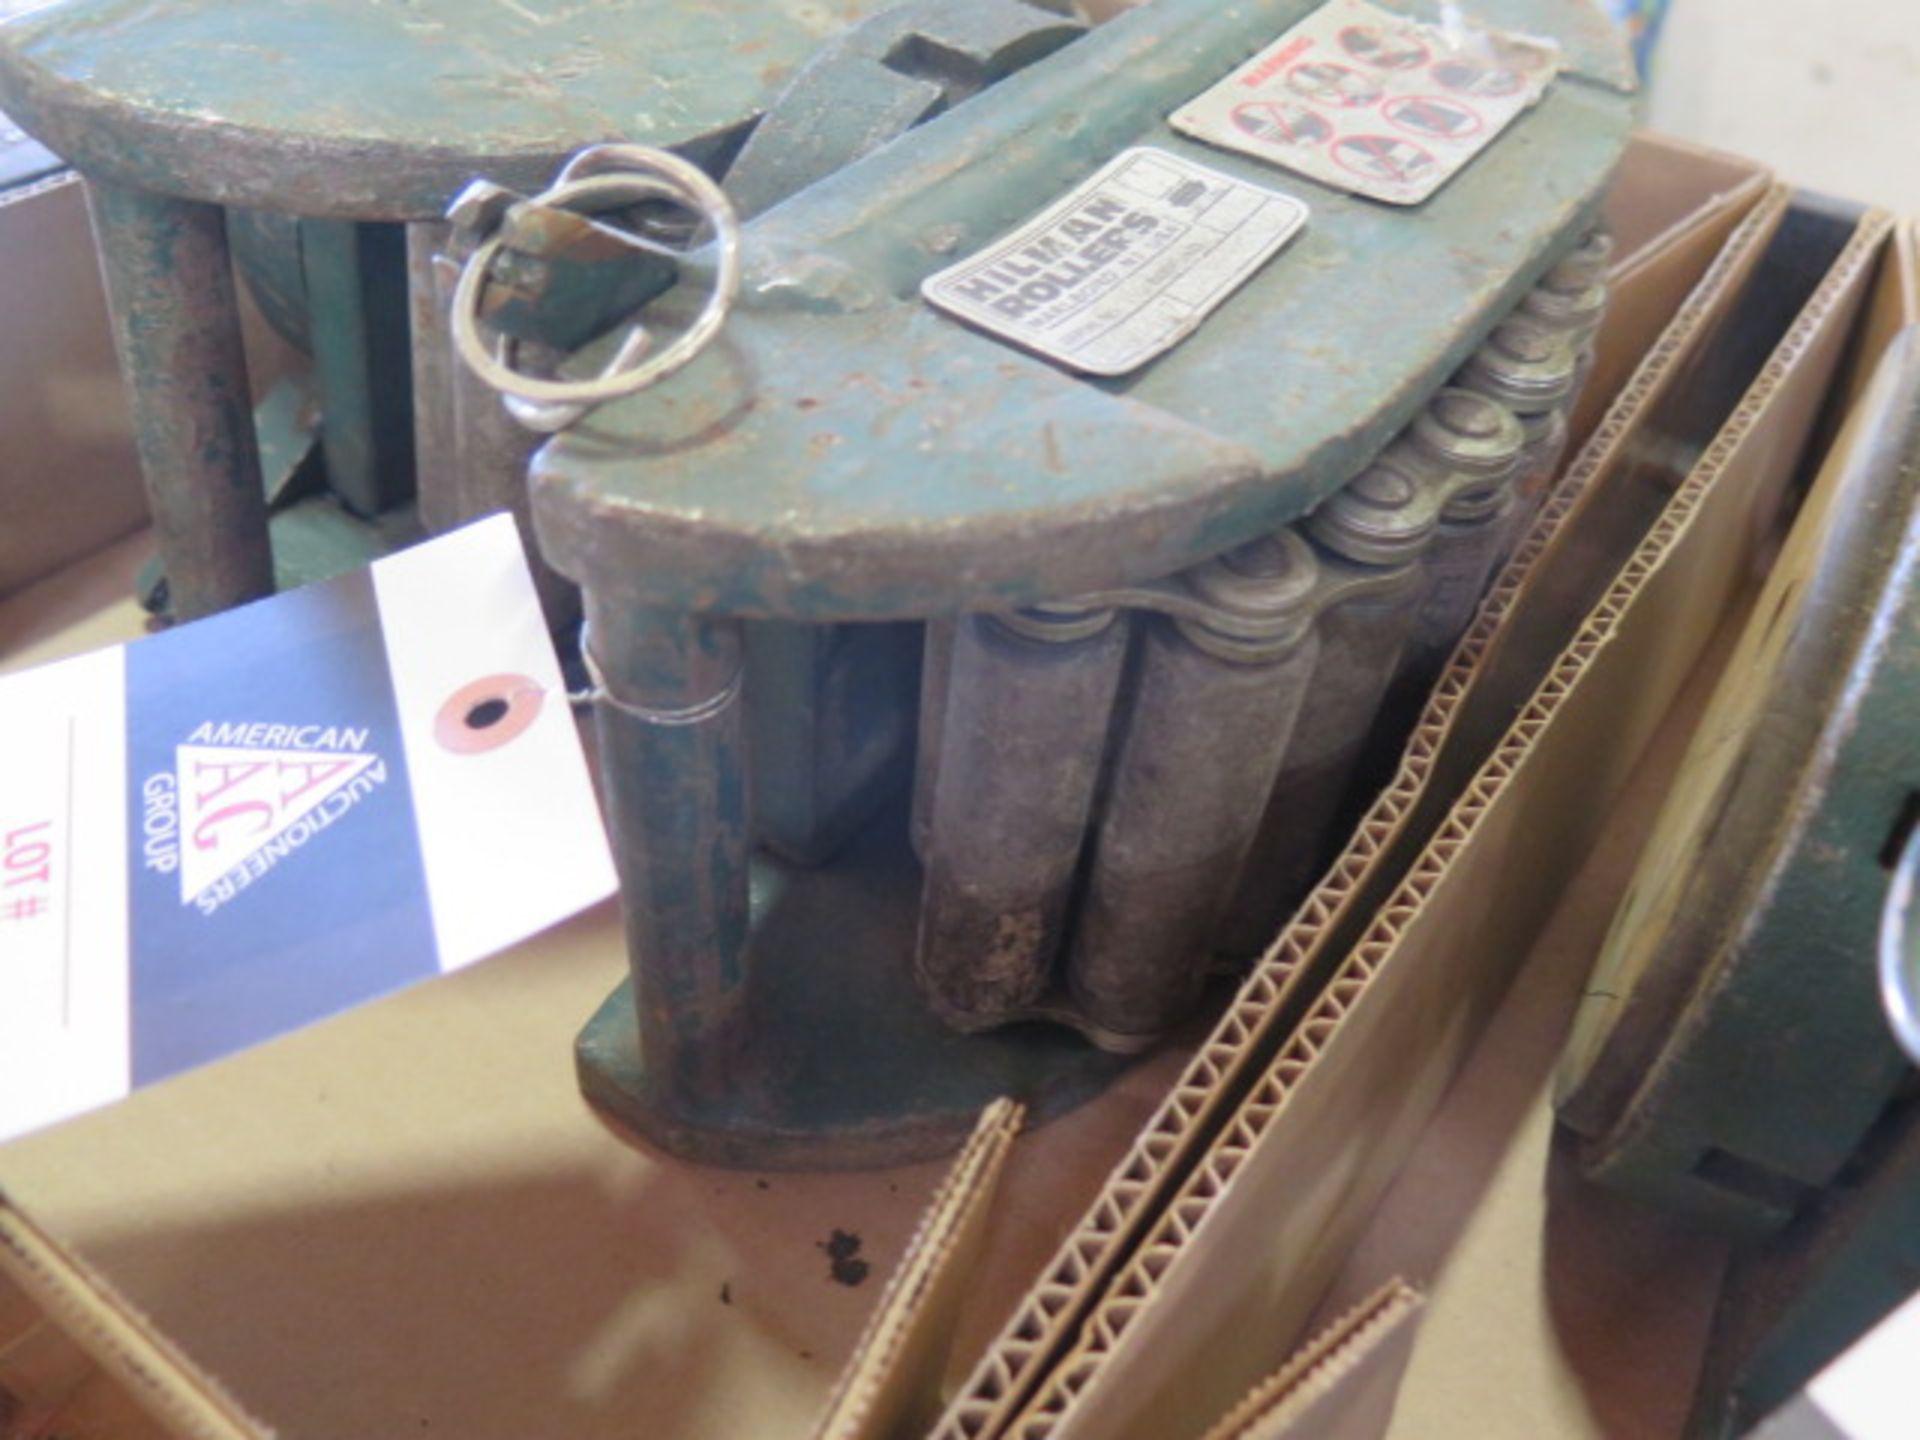 Hilman Machinery Dolleys (2) w/ Steering Bar (SOLD AS-IS - NO WARRANTY) - Image 3 of 5